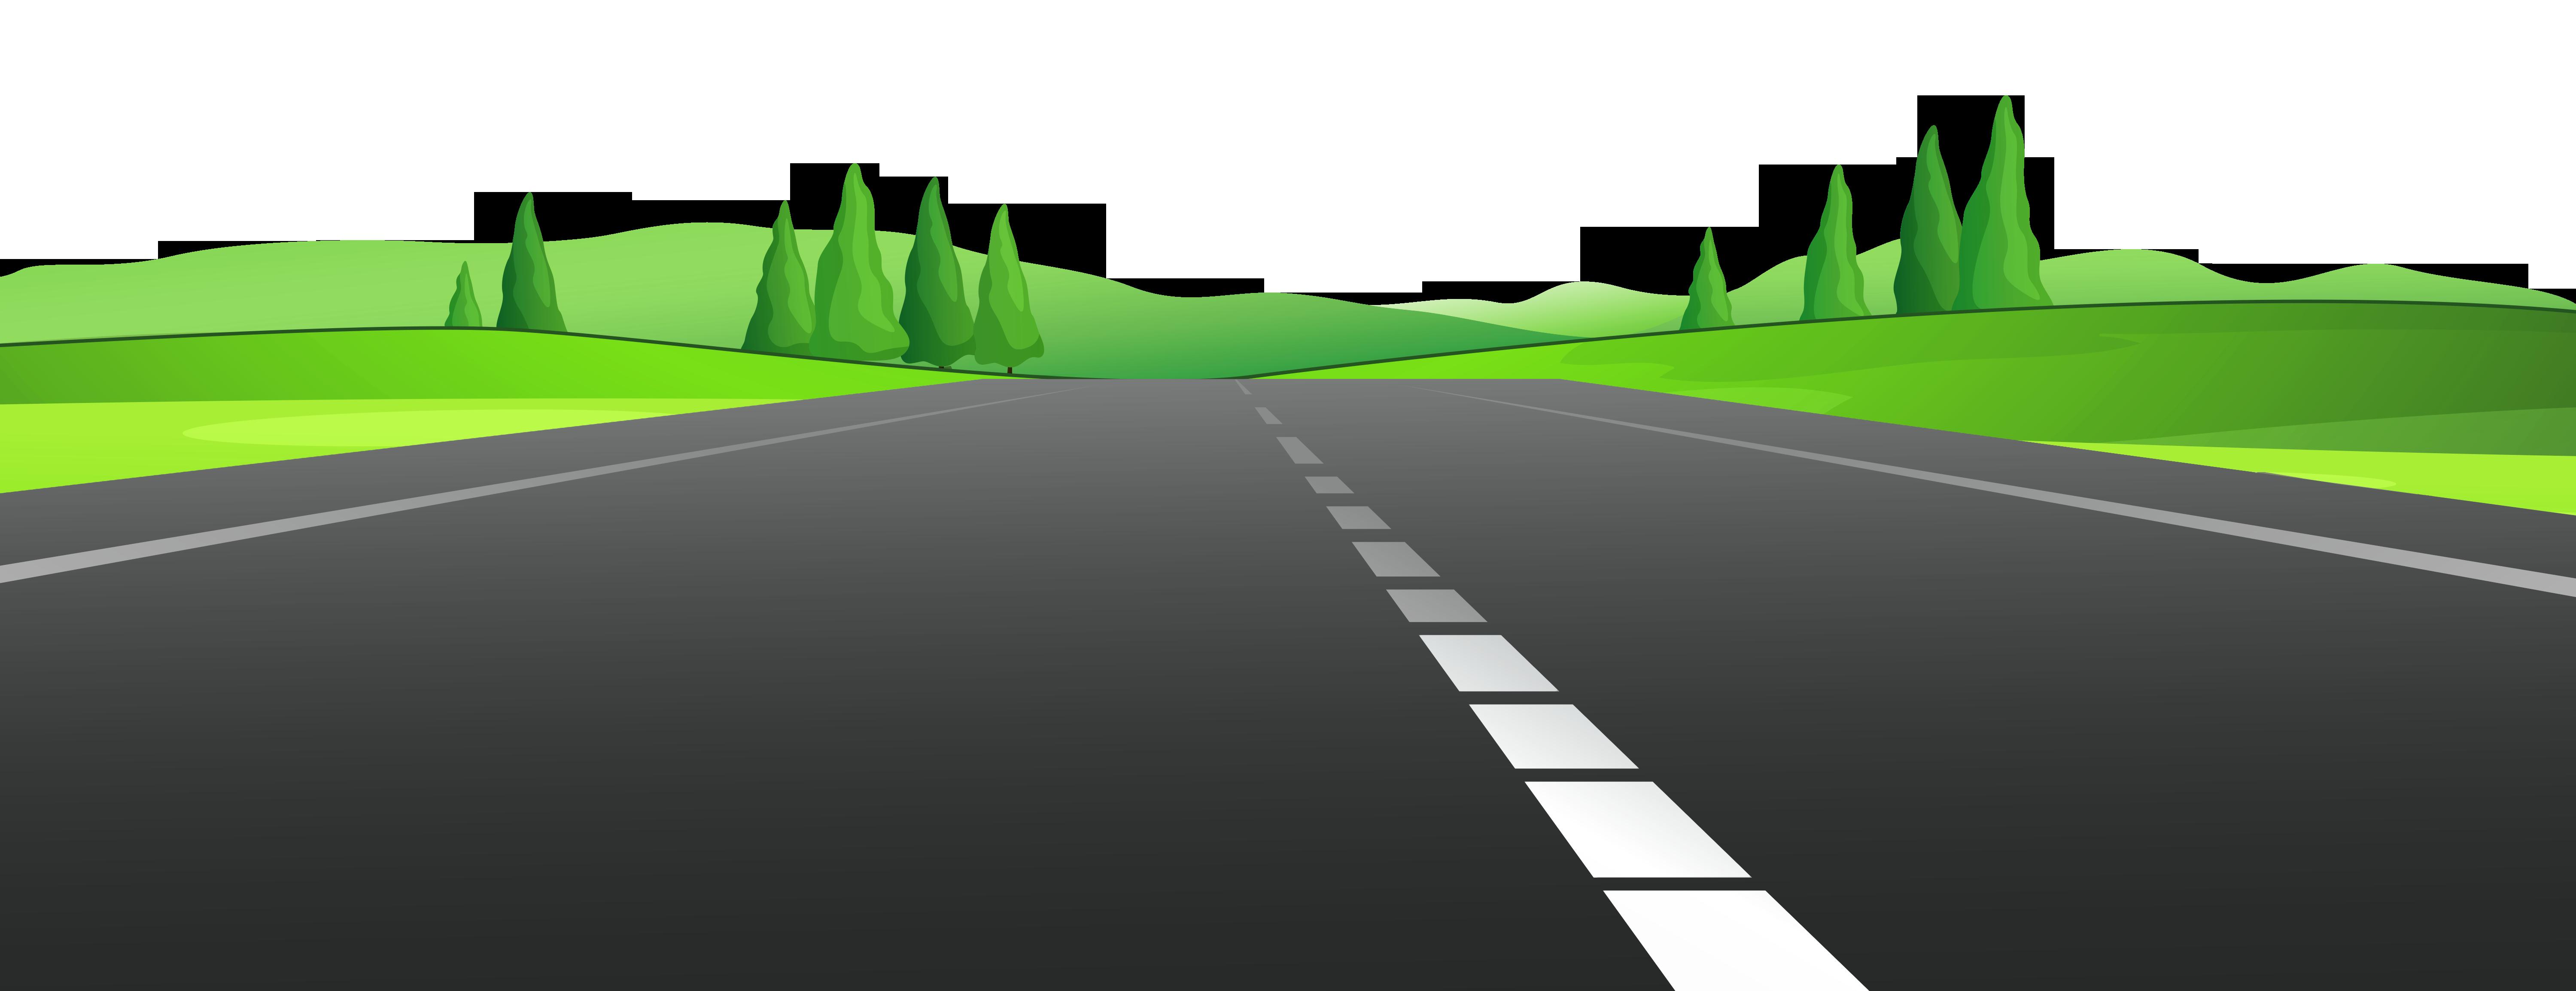 Landscape Roads Clipart-Landscape Roads Clipart-9